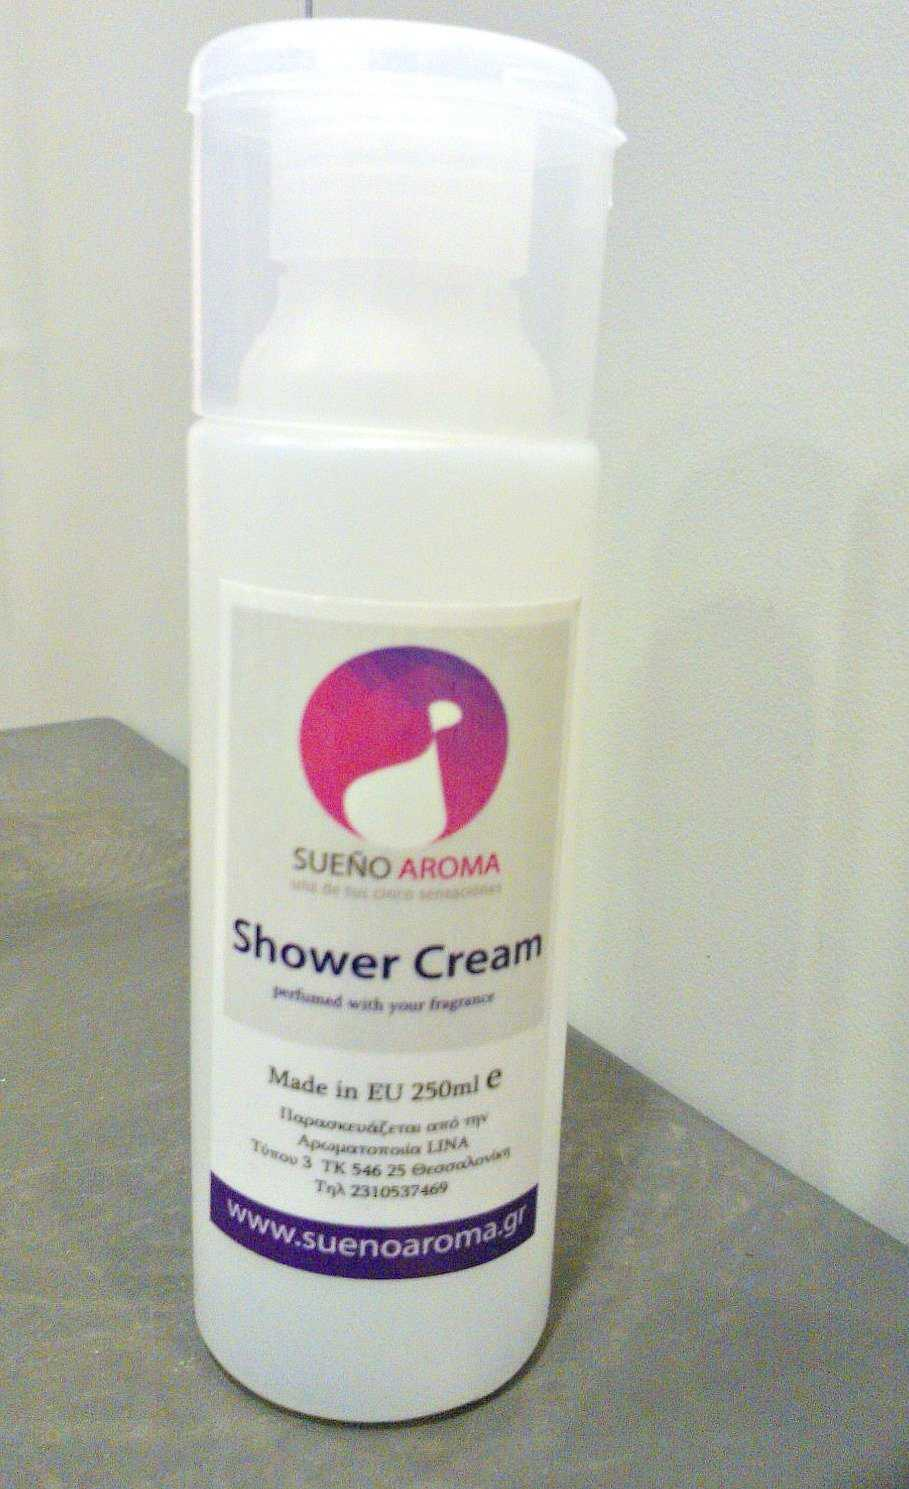 shower cream 250ml